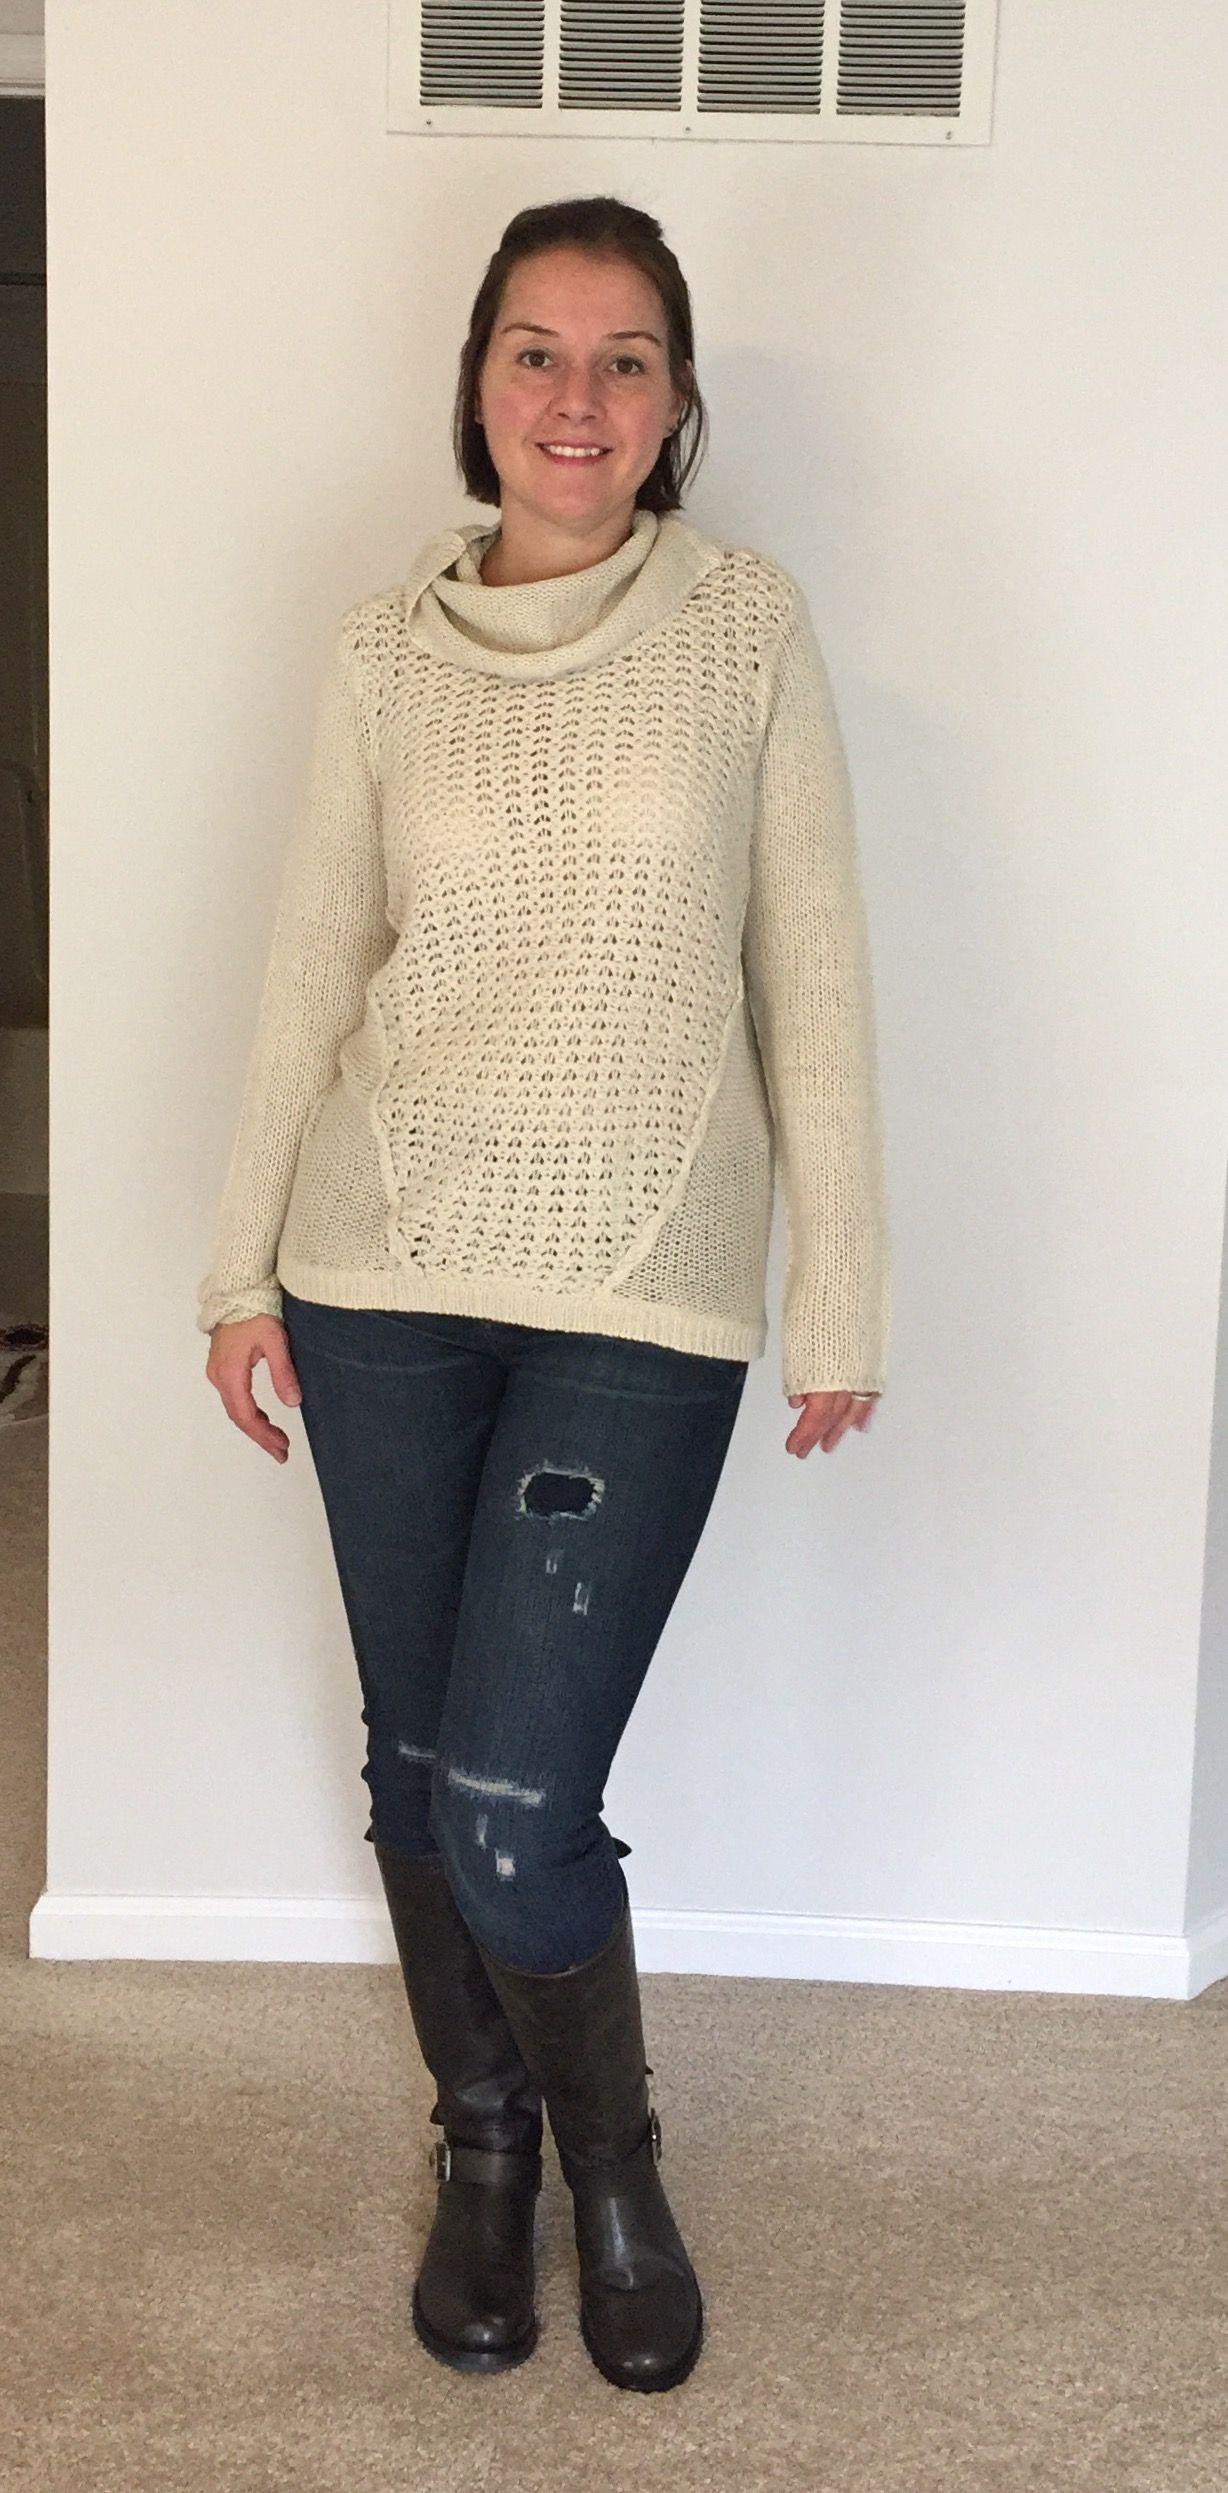 rd style Douglas cowl neck sweater | Stitch Fix | Pinterest | Cowl ...